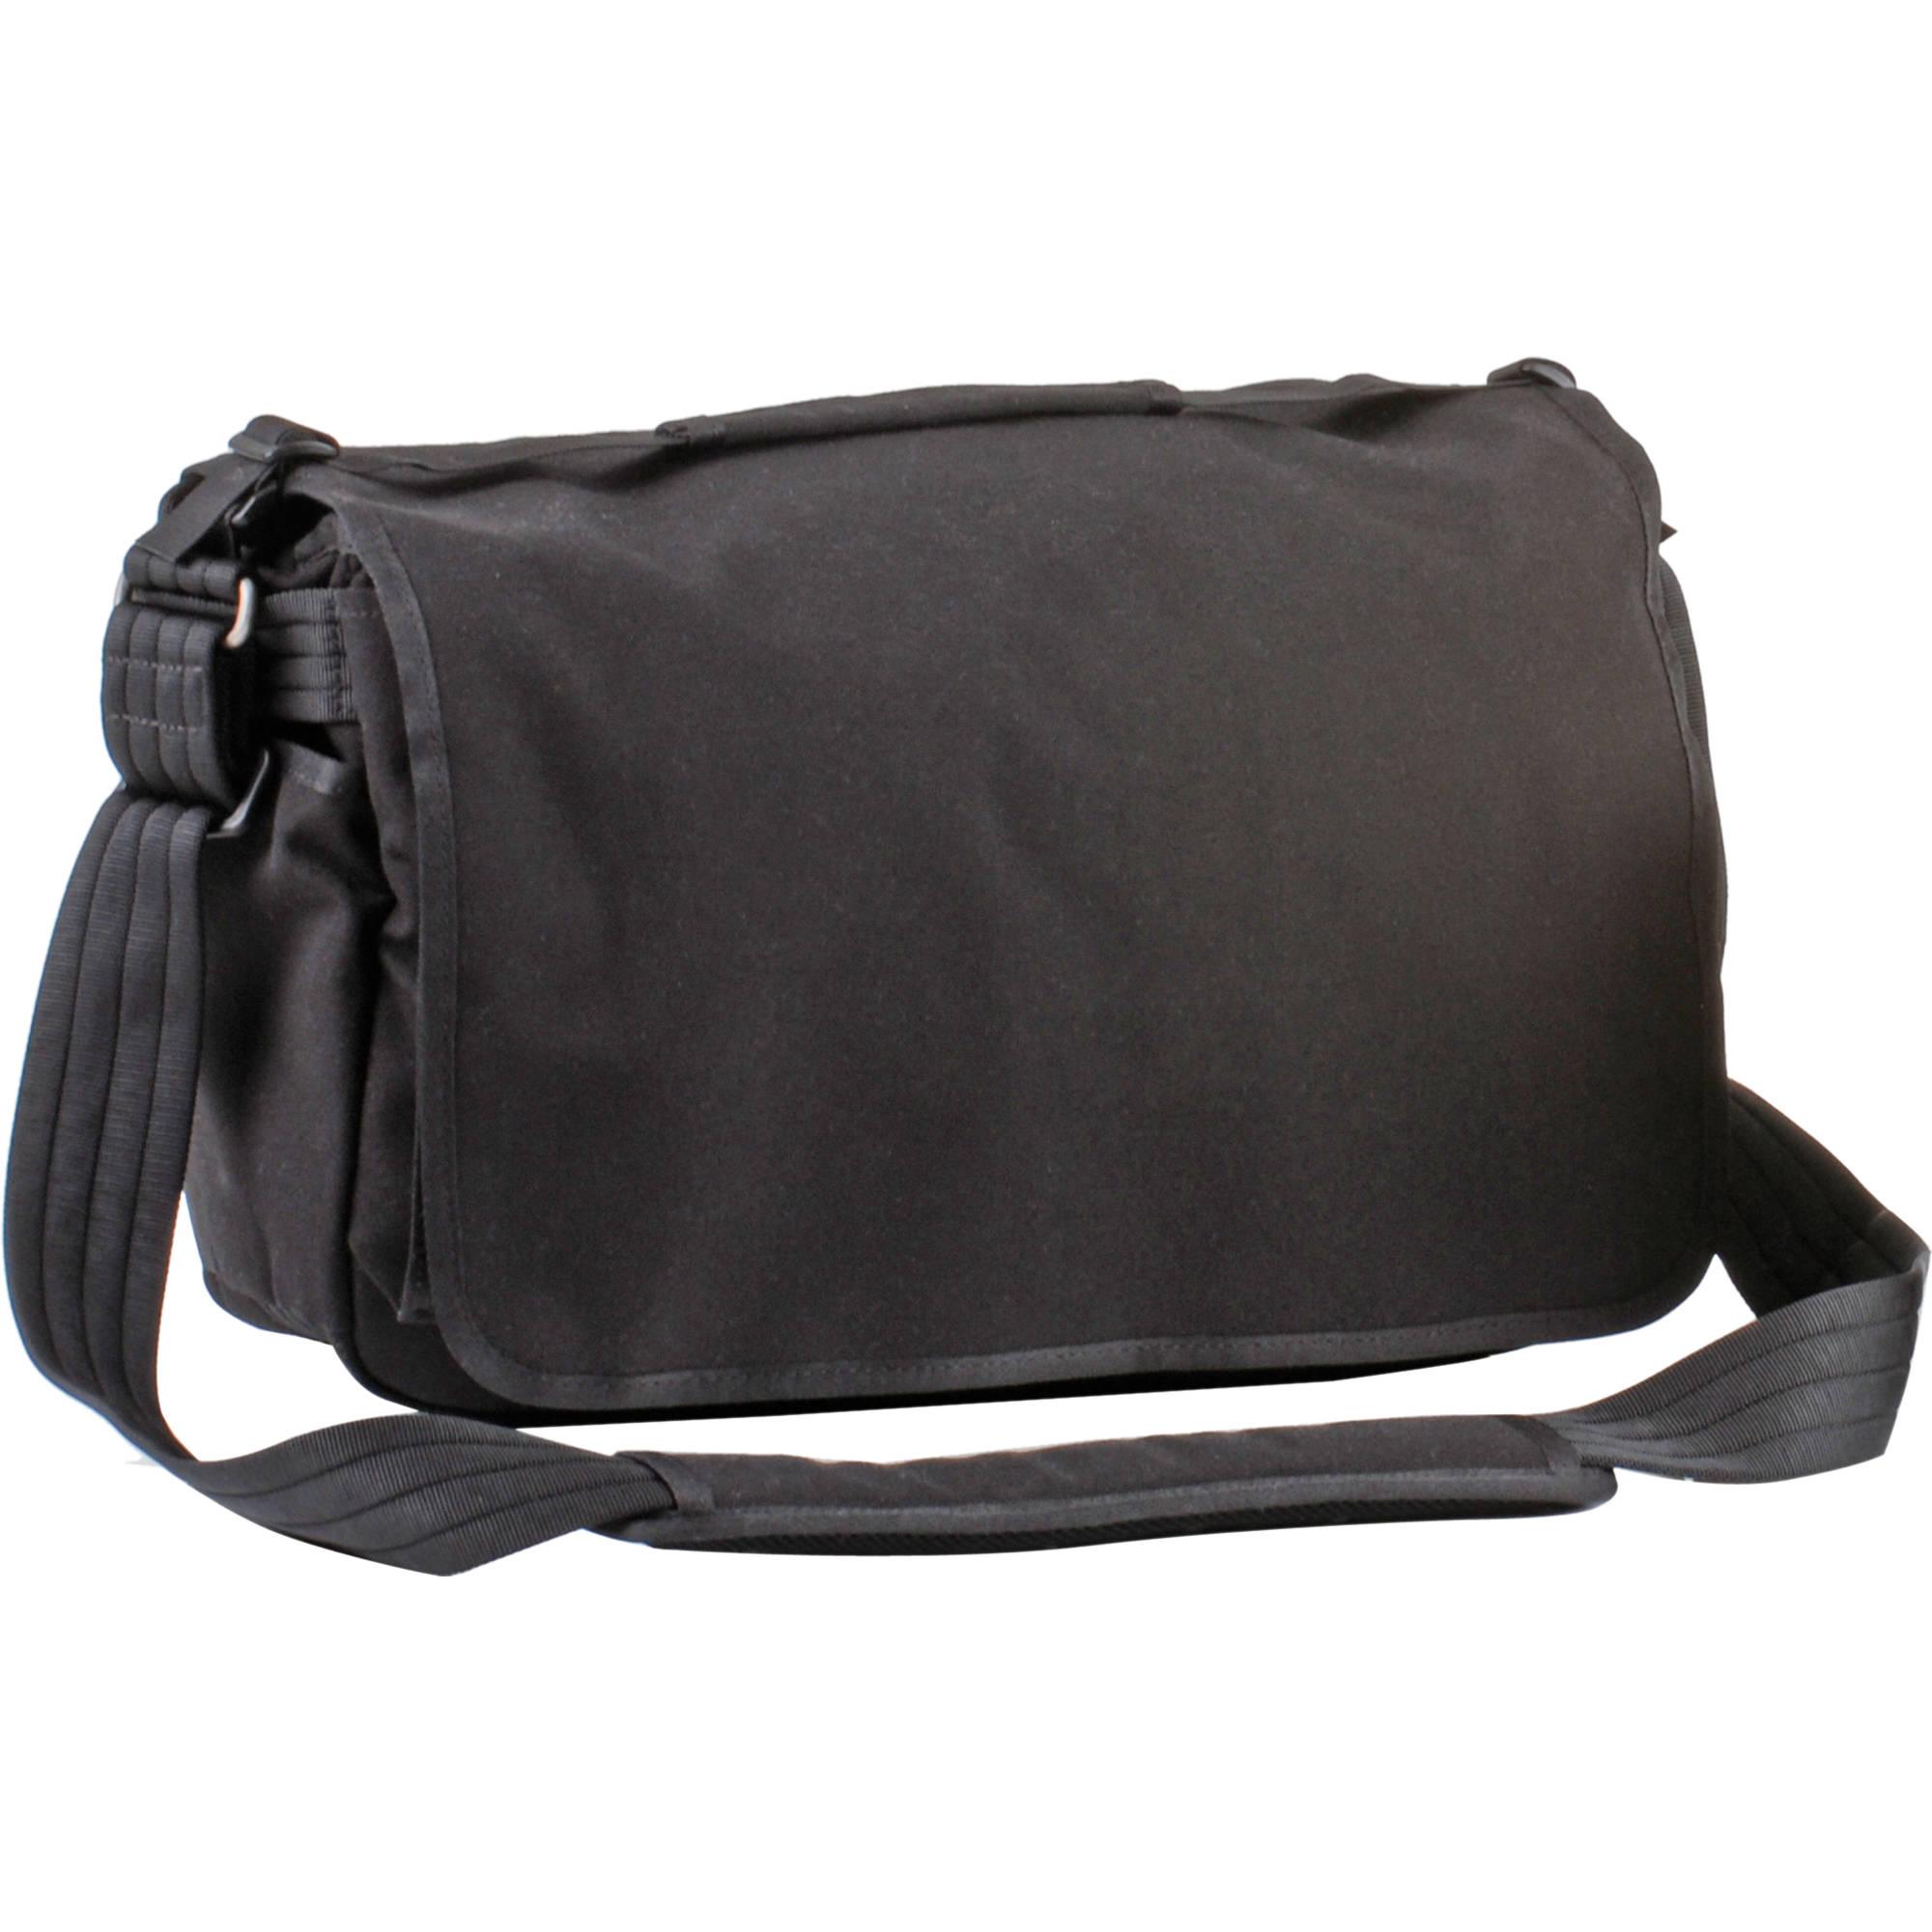 Think Tank Retrospective 30 Small Shoulder Bag Black 19